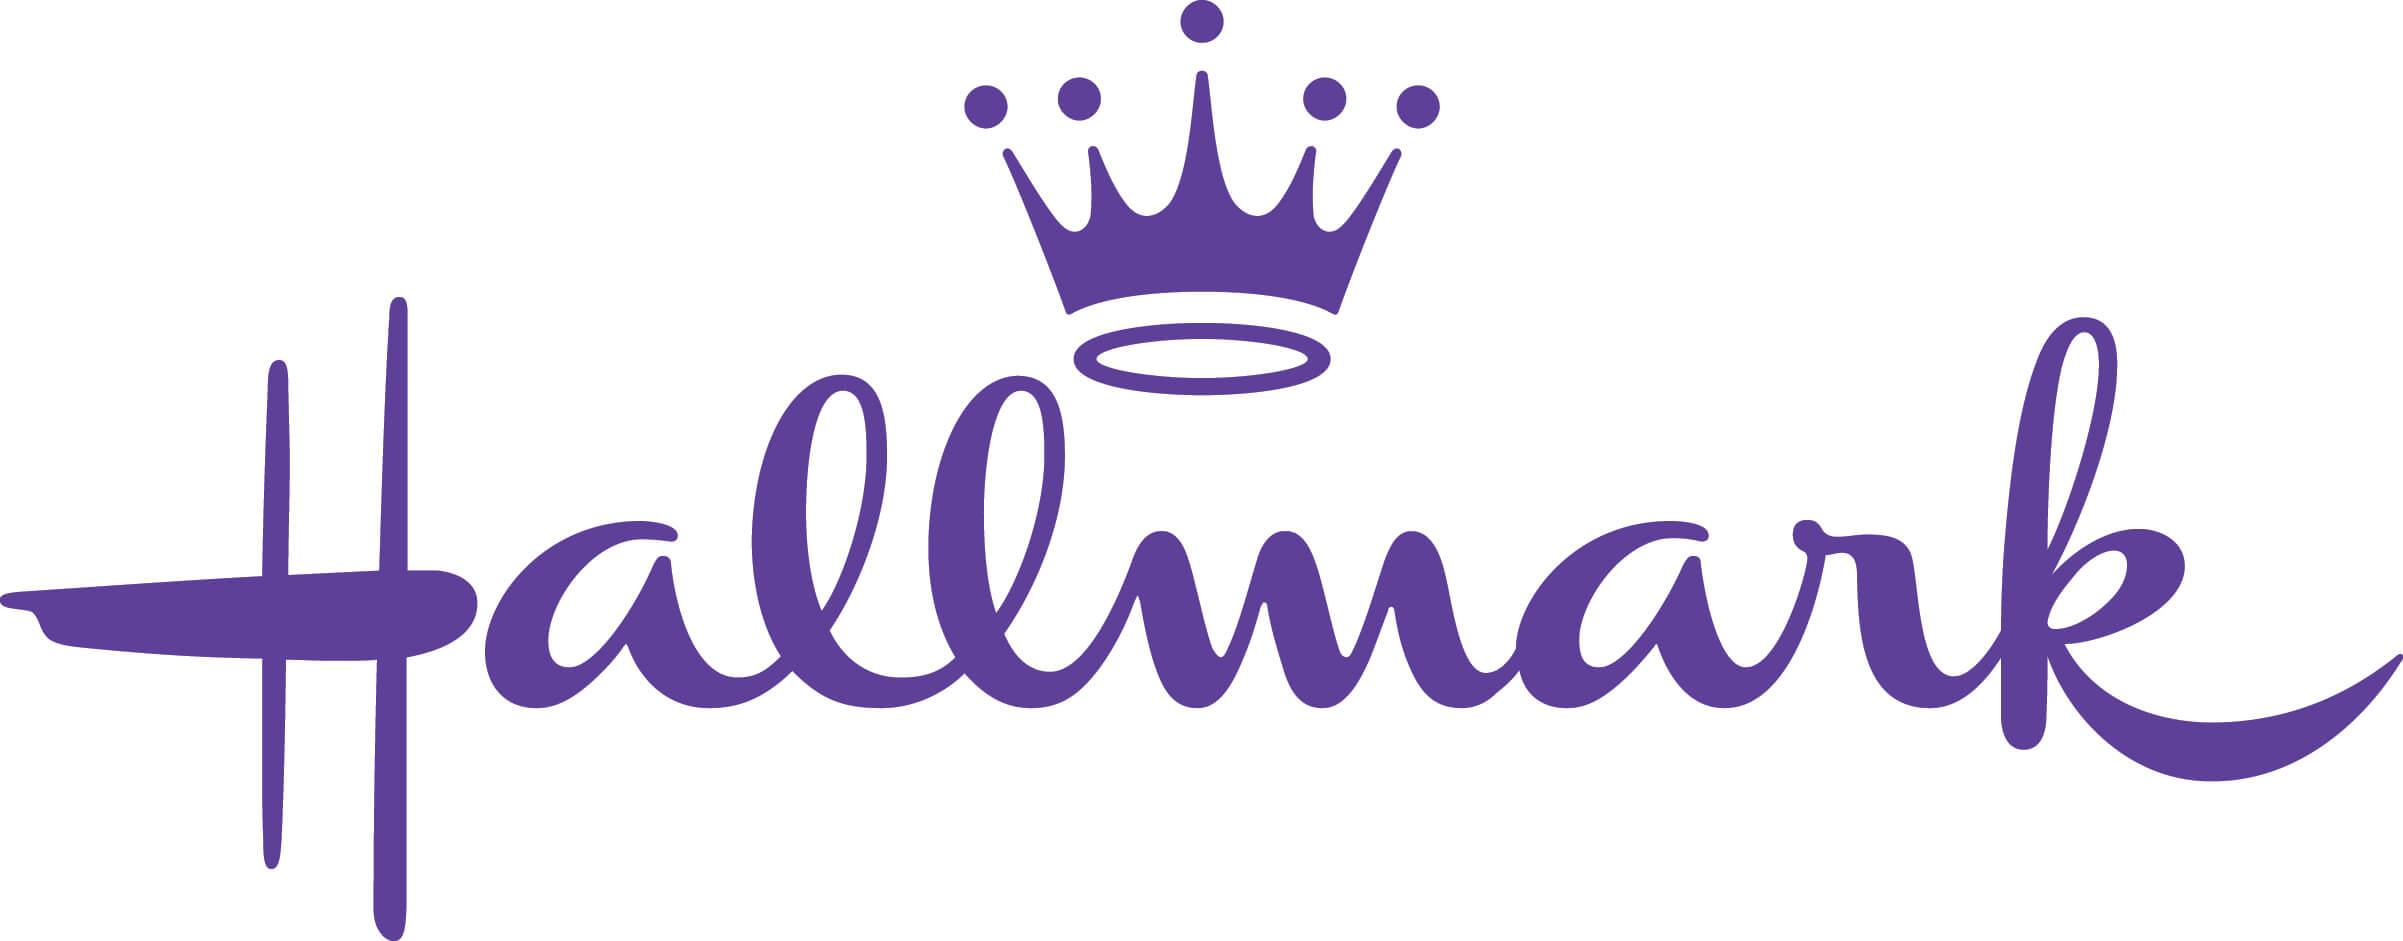 Hallmark Logo 2018